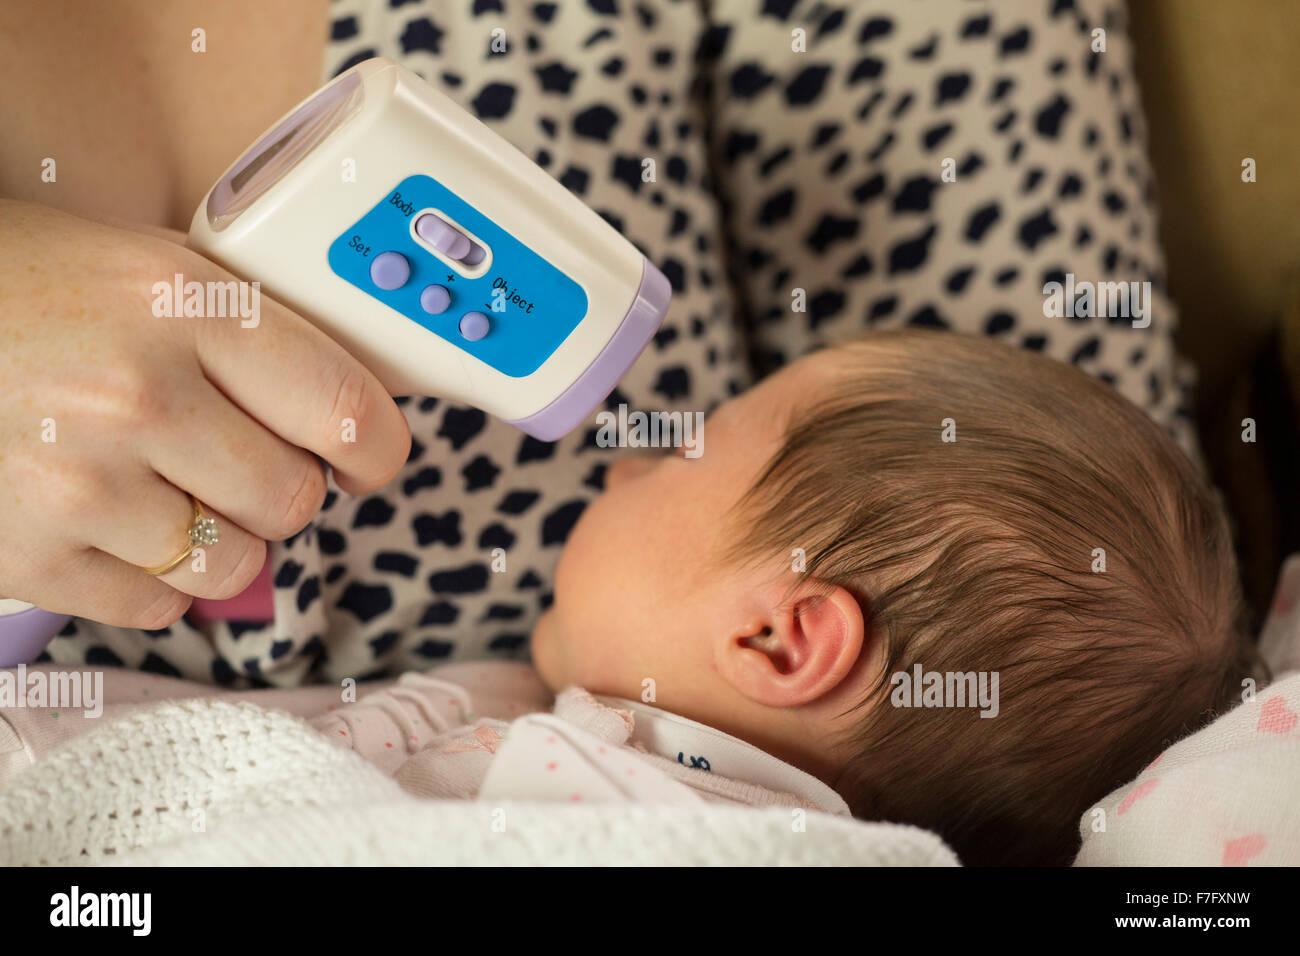 mum checking newborn baby temperature with infrared thermometer - Stock Image